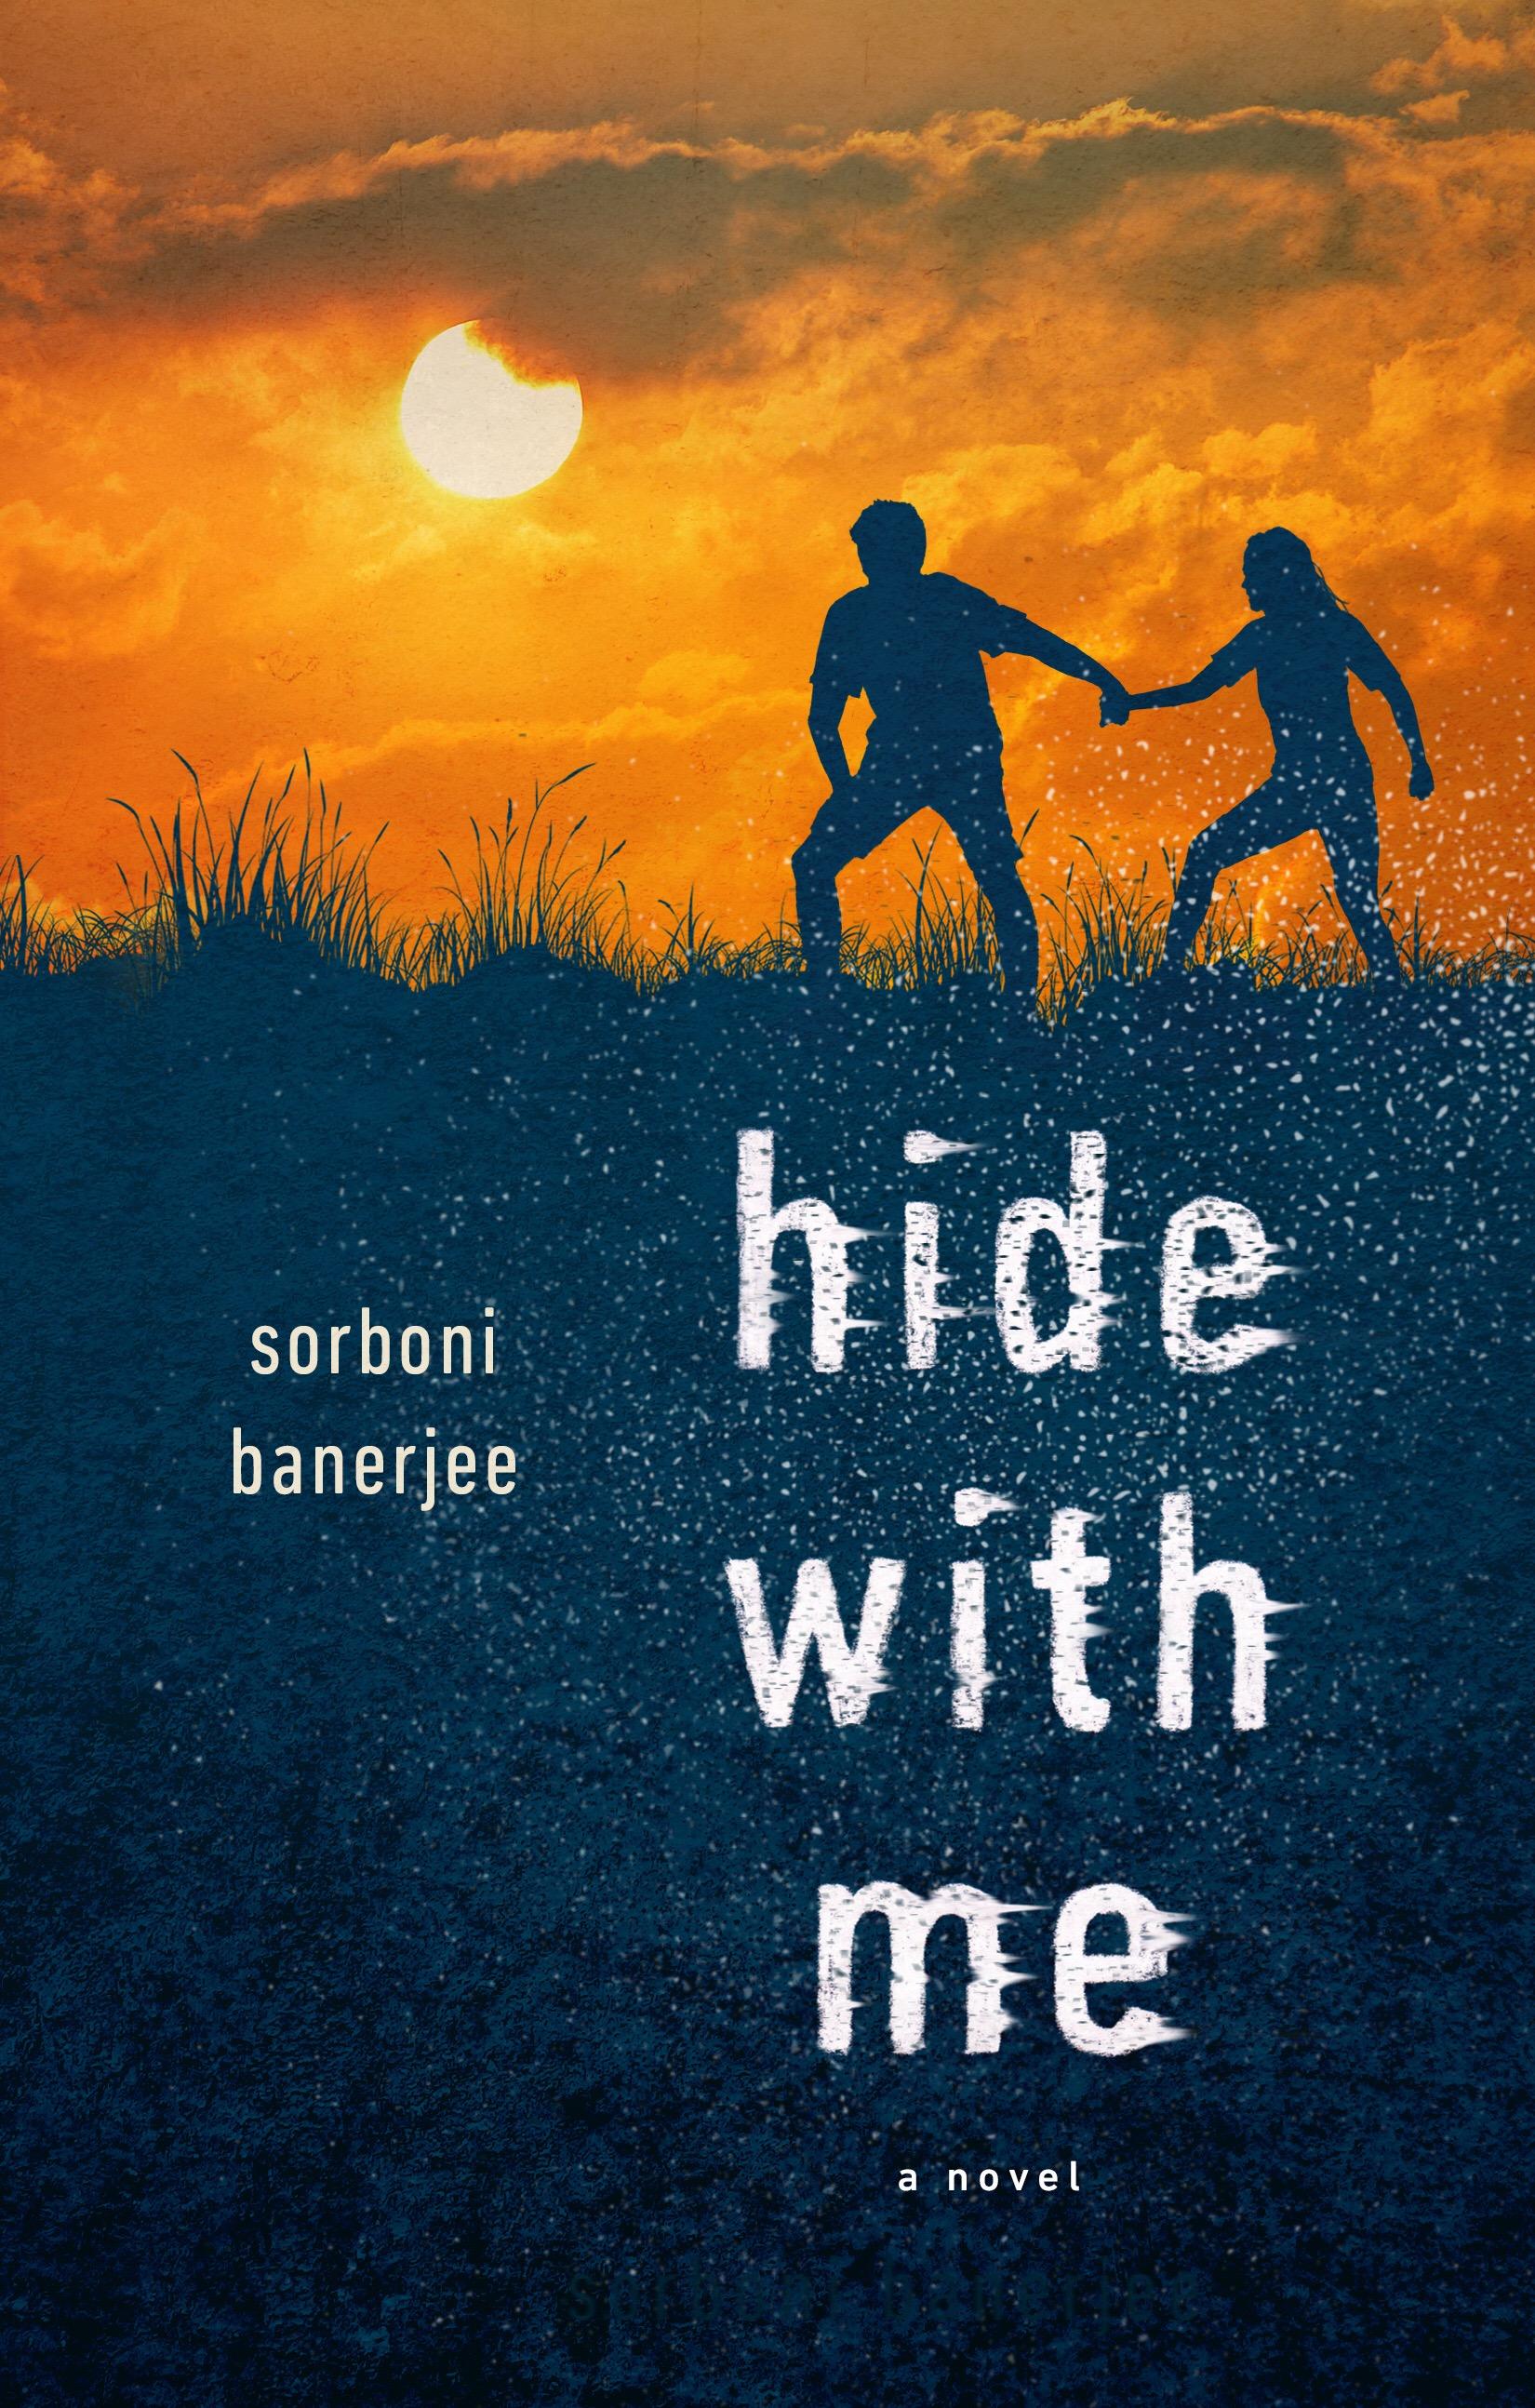 Banerjee Book Cover.JPG